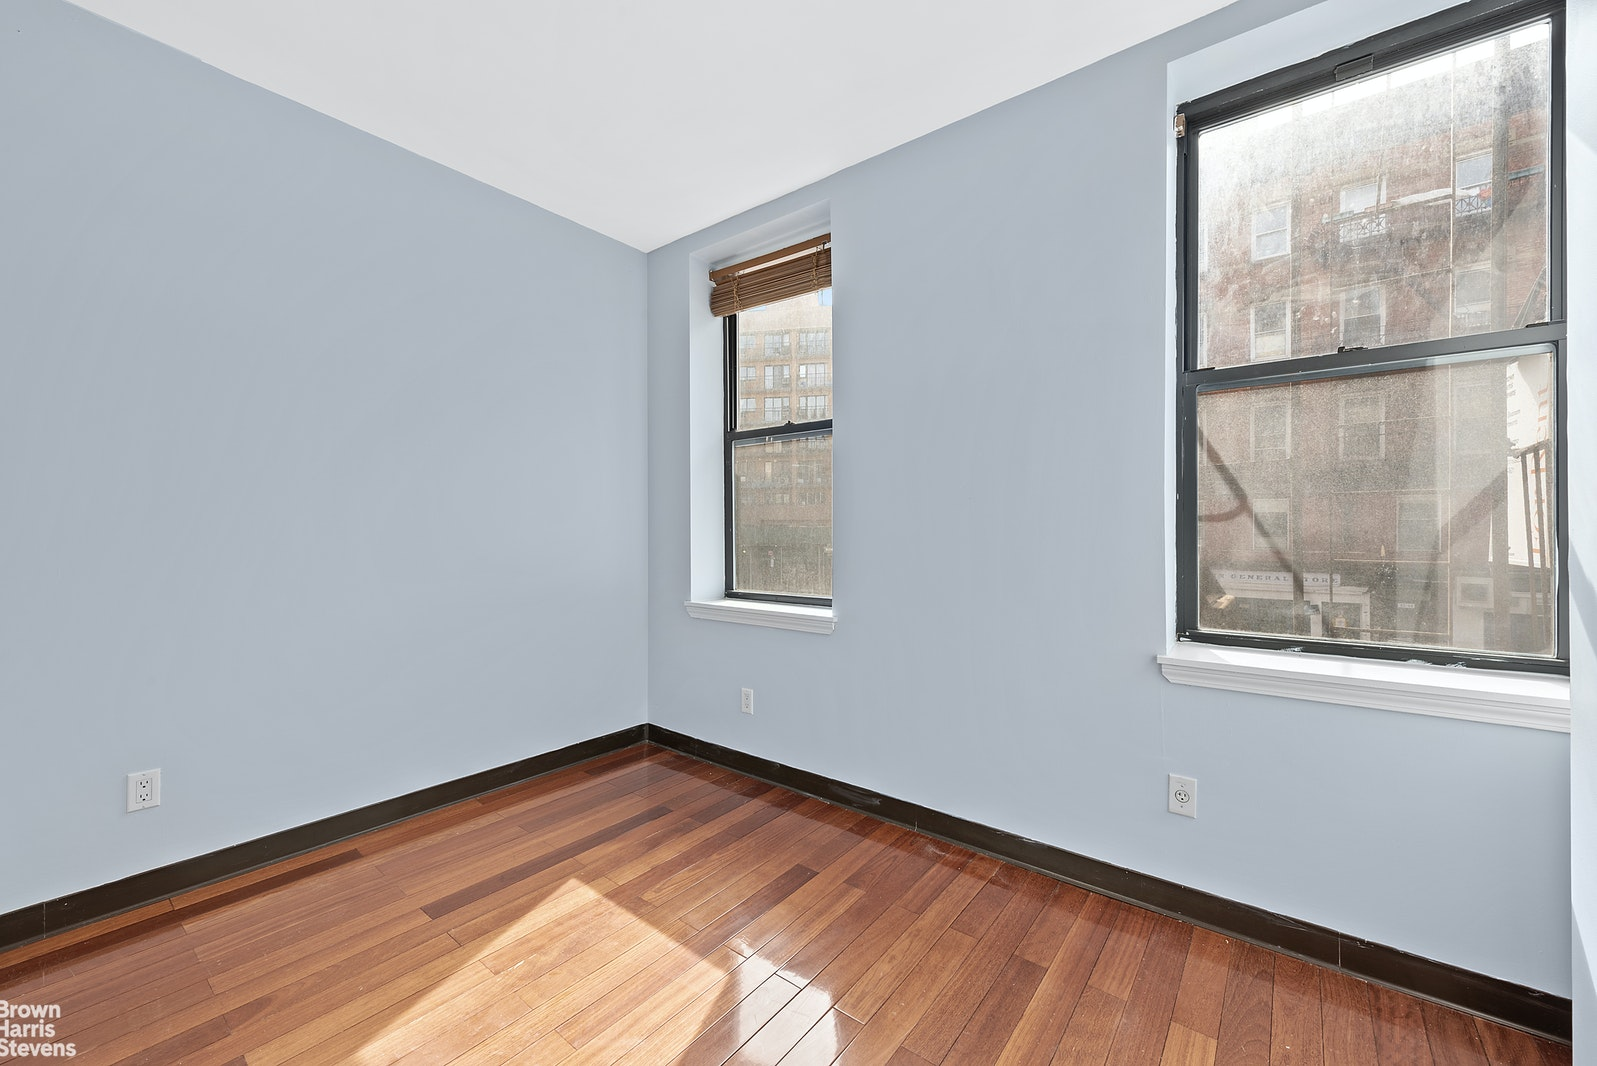 43 CANAL STREET 2ND, Lower East Side, $3,200, Web #: 20484846